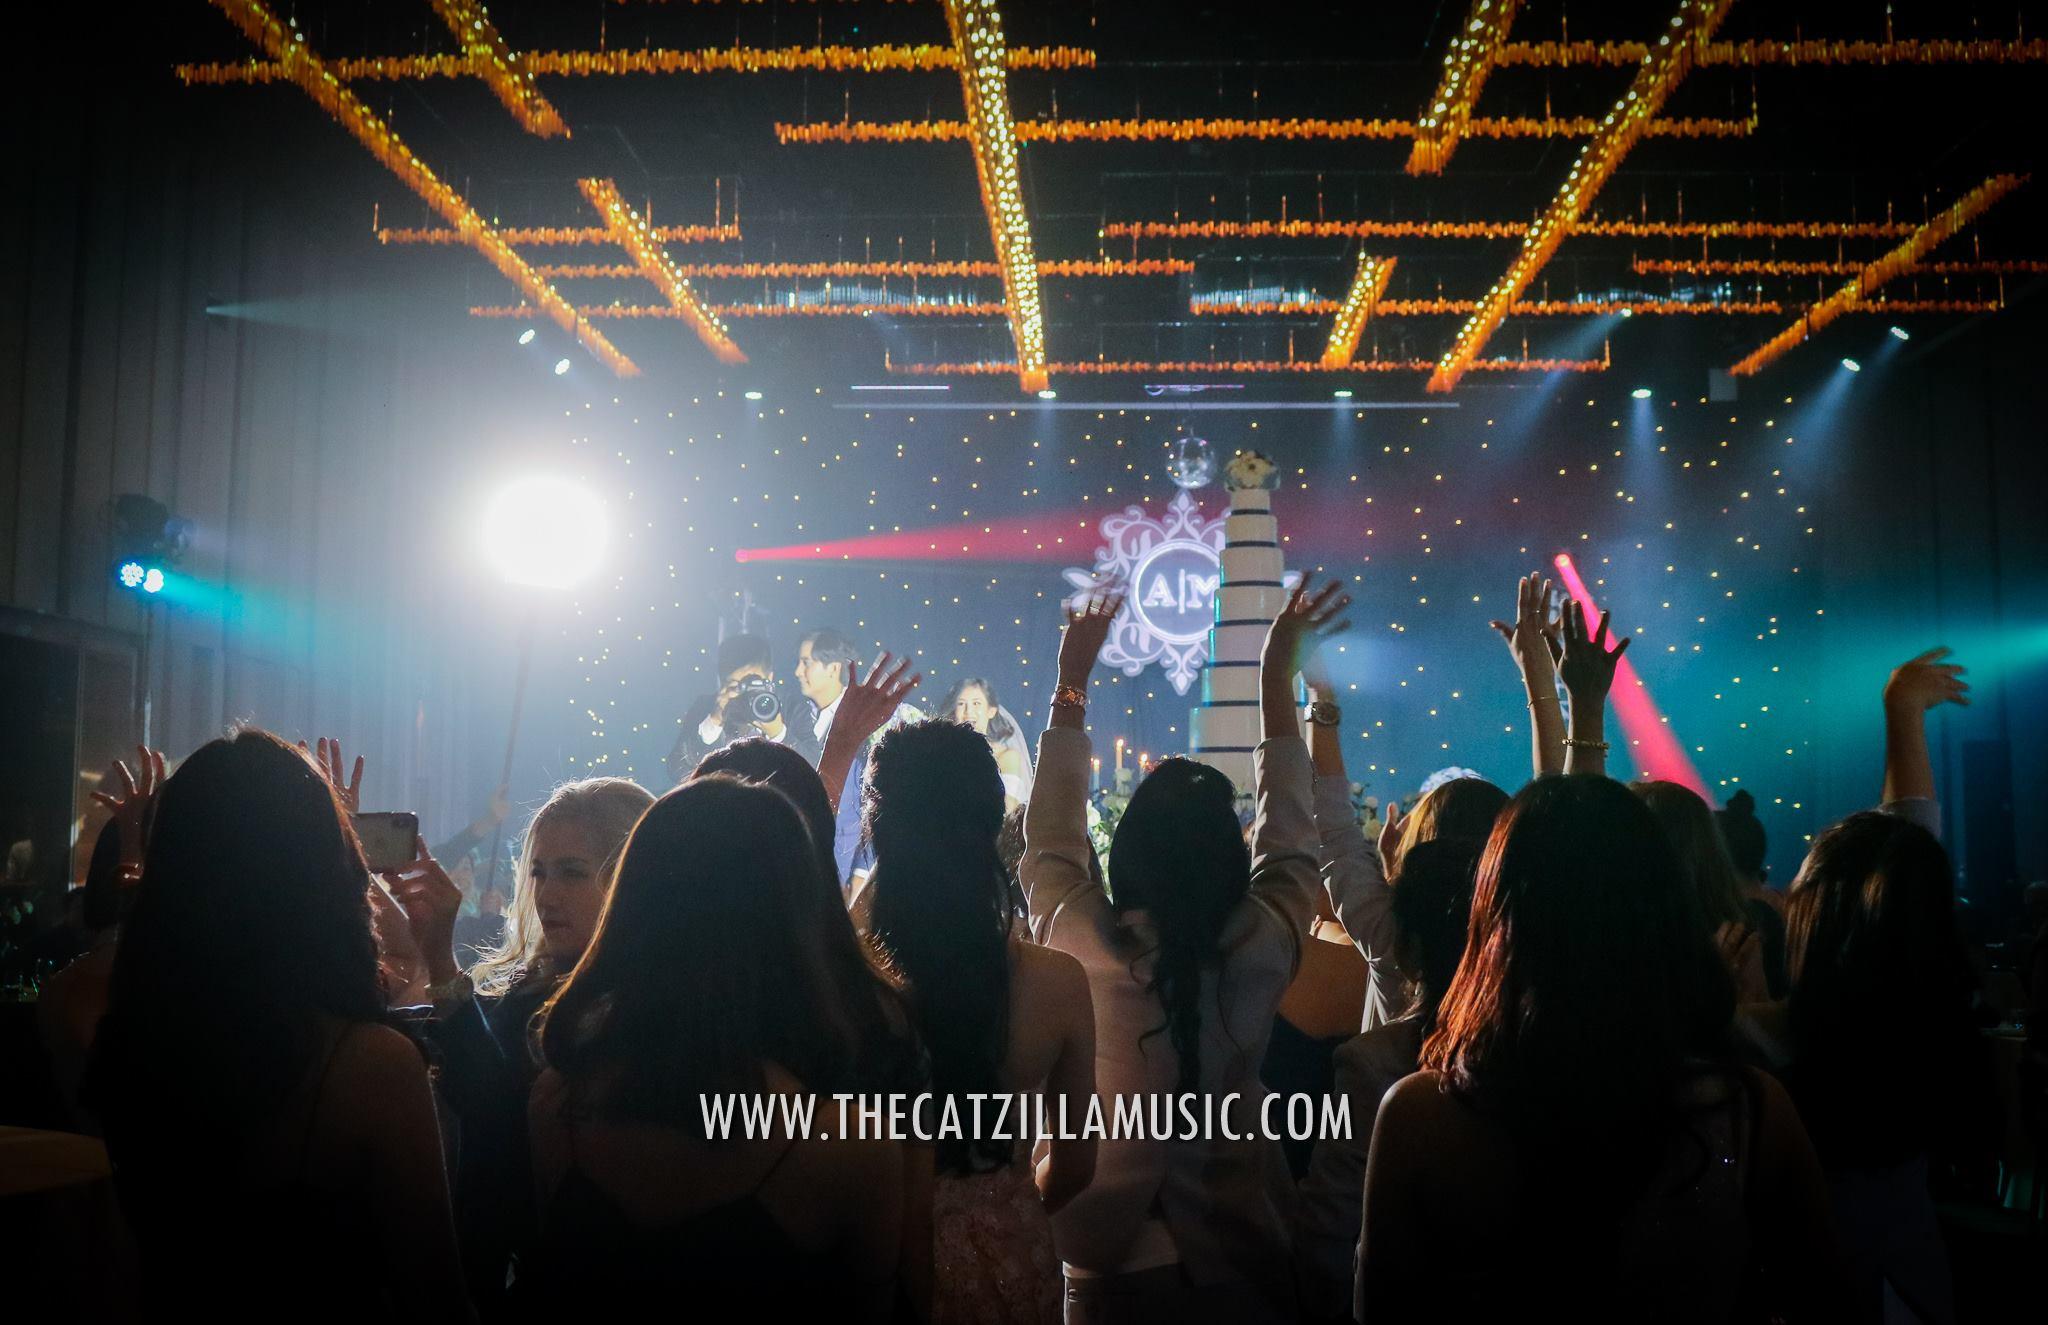 After-Party-Wedding-Pullman-King-Power-After Party งานแต่งงาน-วงดนตรีงานเลี้ยง-บุ๋นแบนด์-Catzilla (4)